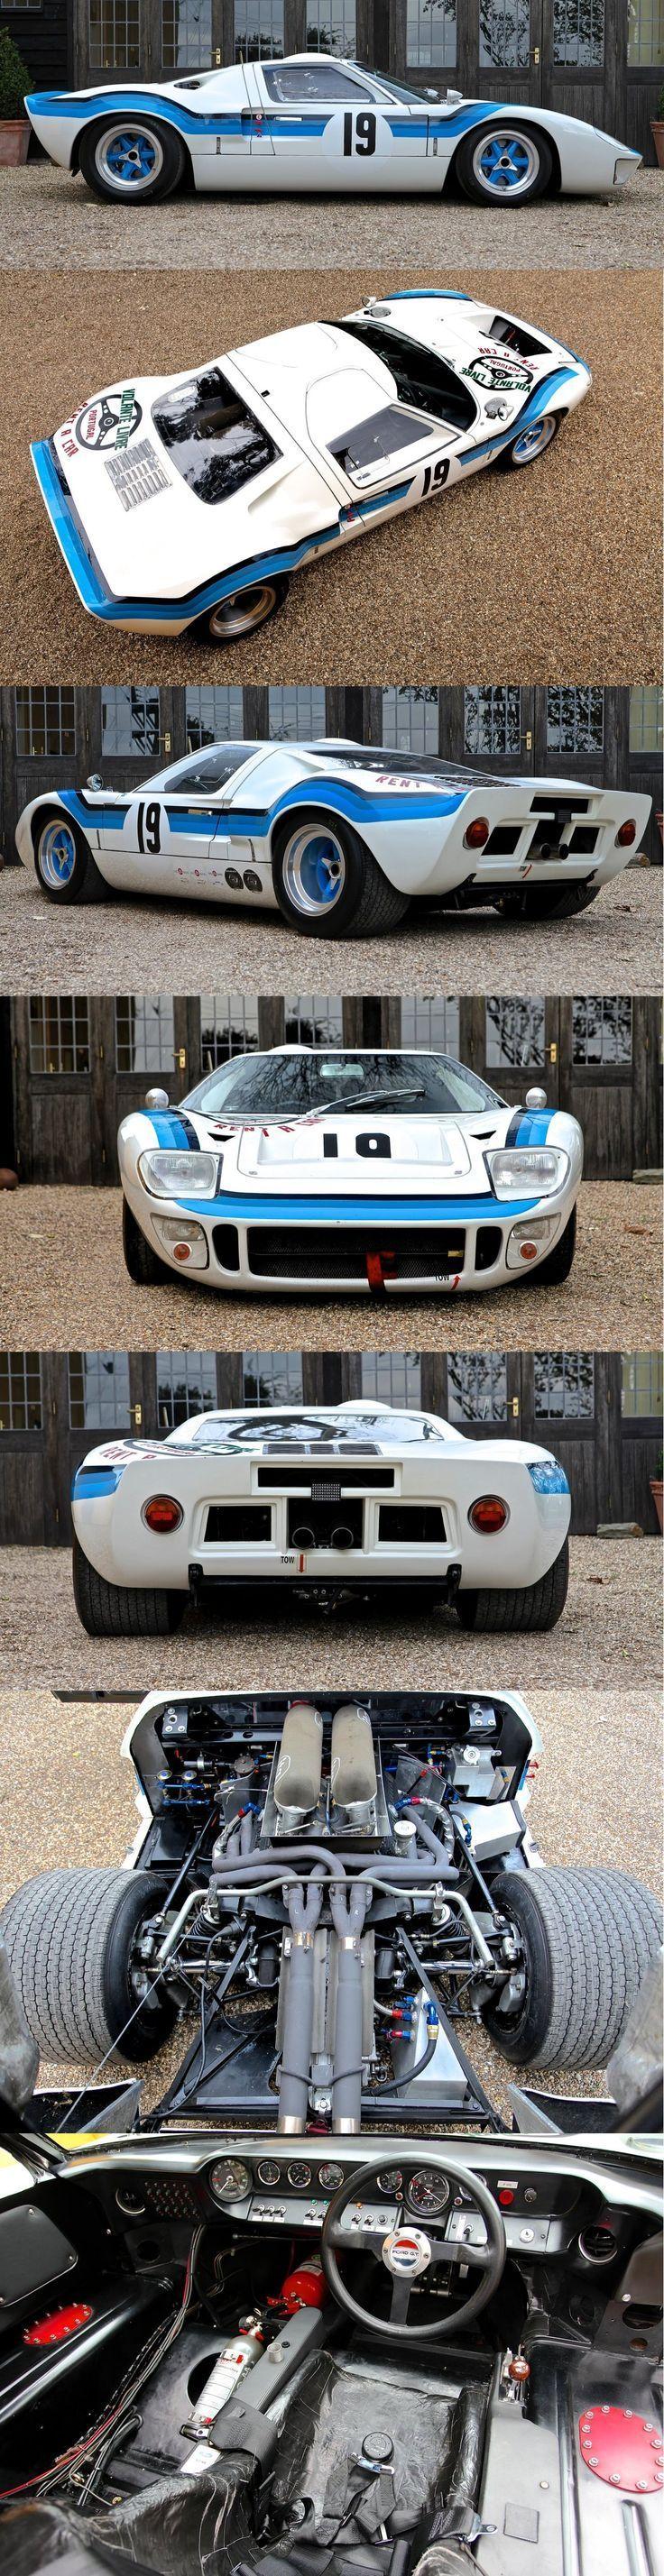 Best Top Sports Cars Ideas On Pinterest Lamborghini - Top 3 sports cars